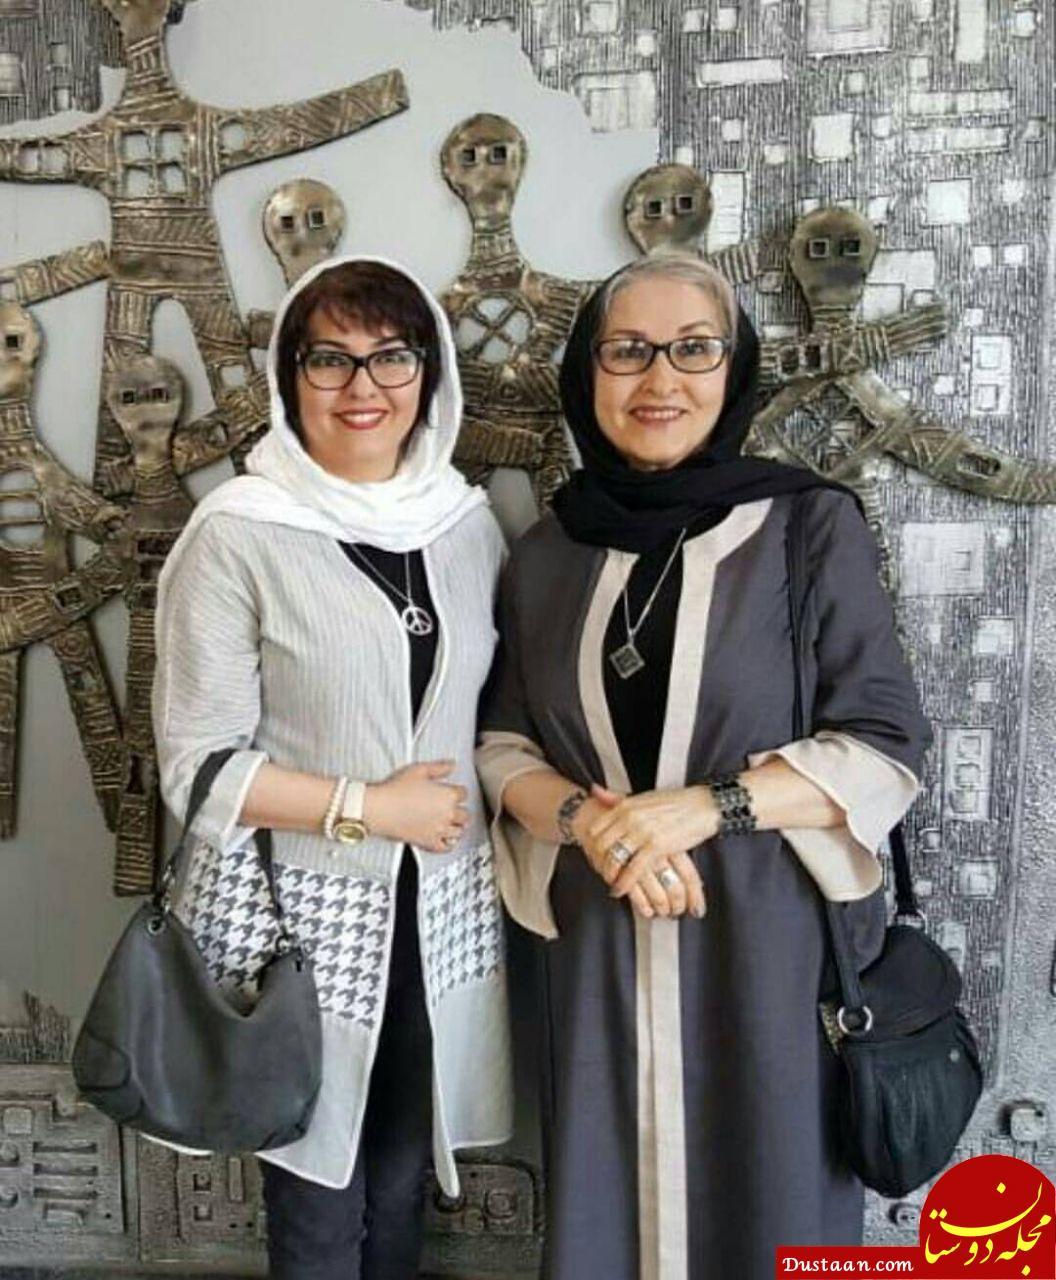 www.dustaan.com تصویری زیبا از آناهیتا همتی و مادرش